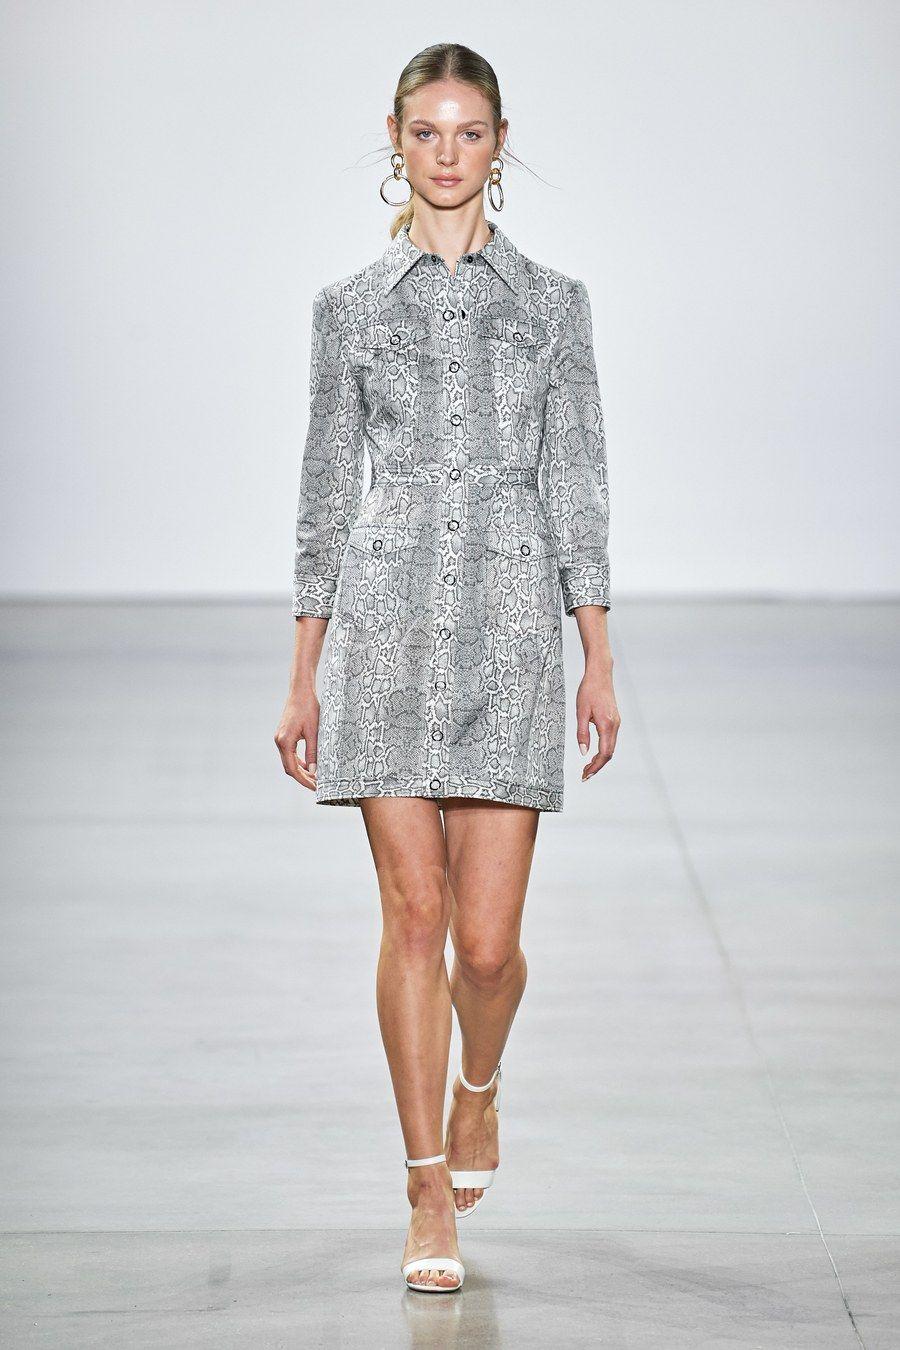 Elie Tahari Spring 2020 Ready To Wear Fashion Show With Images Fashion Spring Collection Fashion Ready To Wear